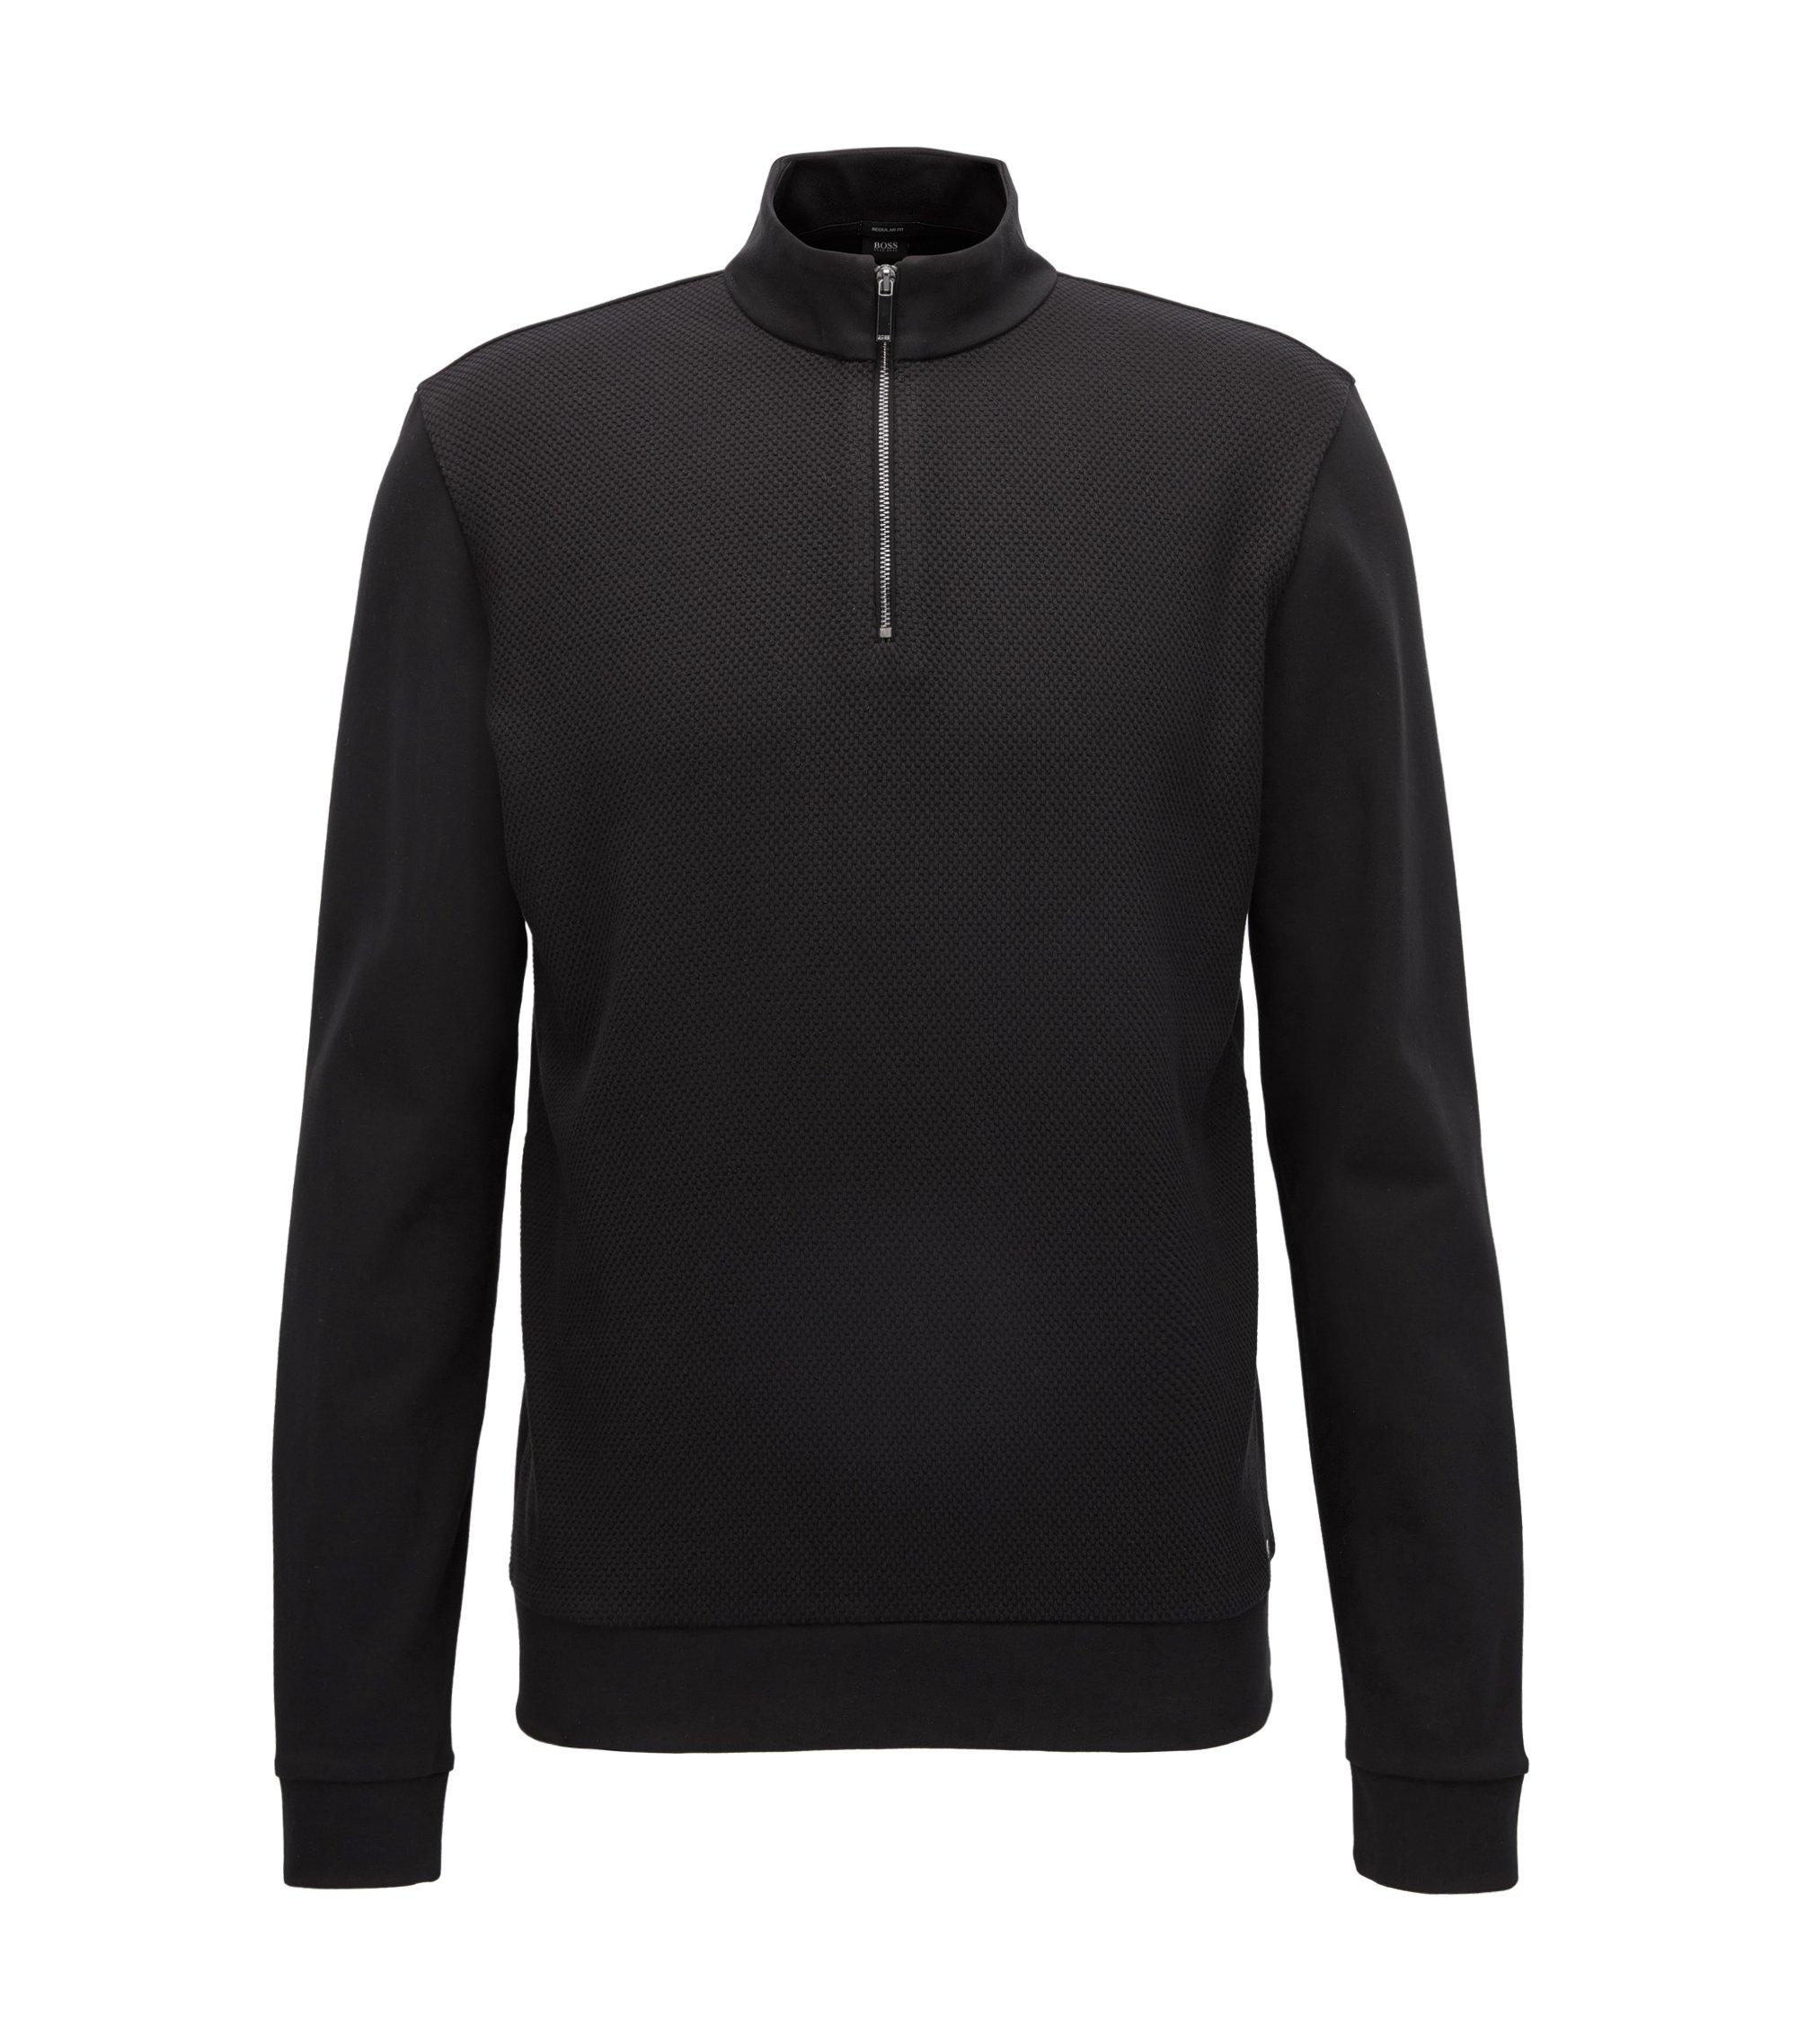 'Sidney' | Cotton Birdseye Troyer Sweatshirt, Black